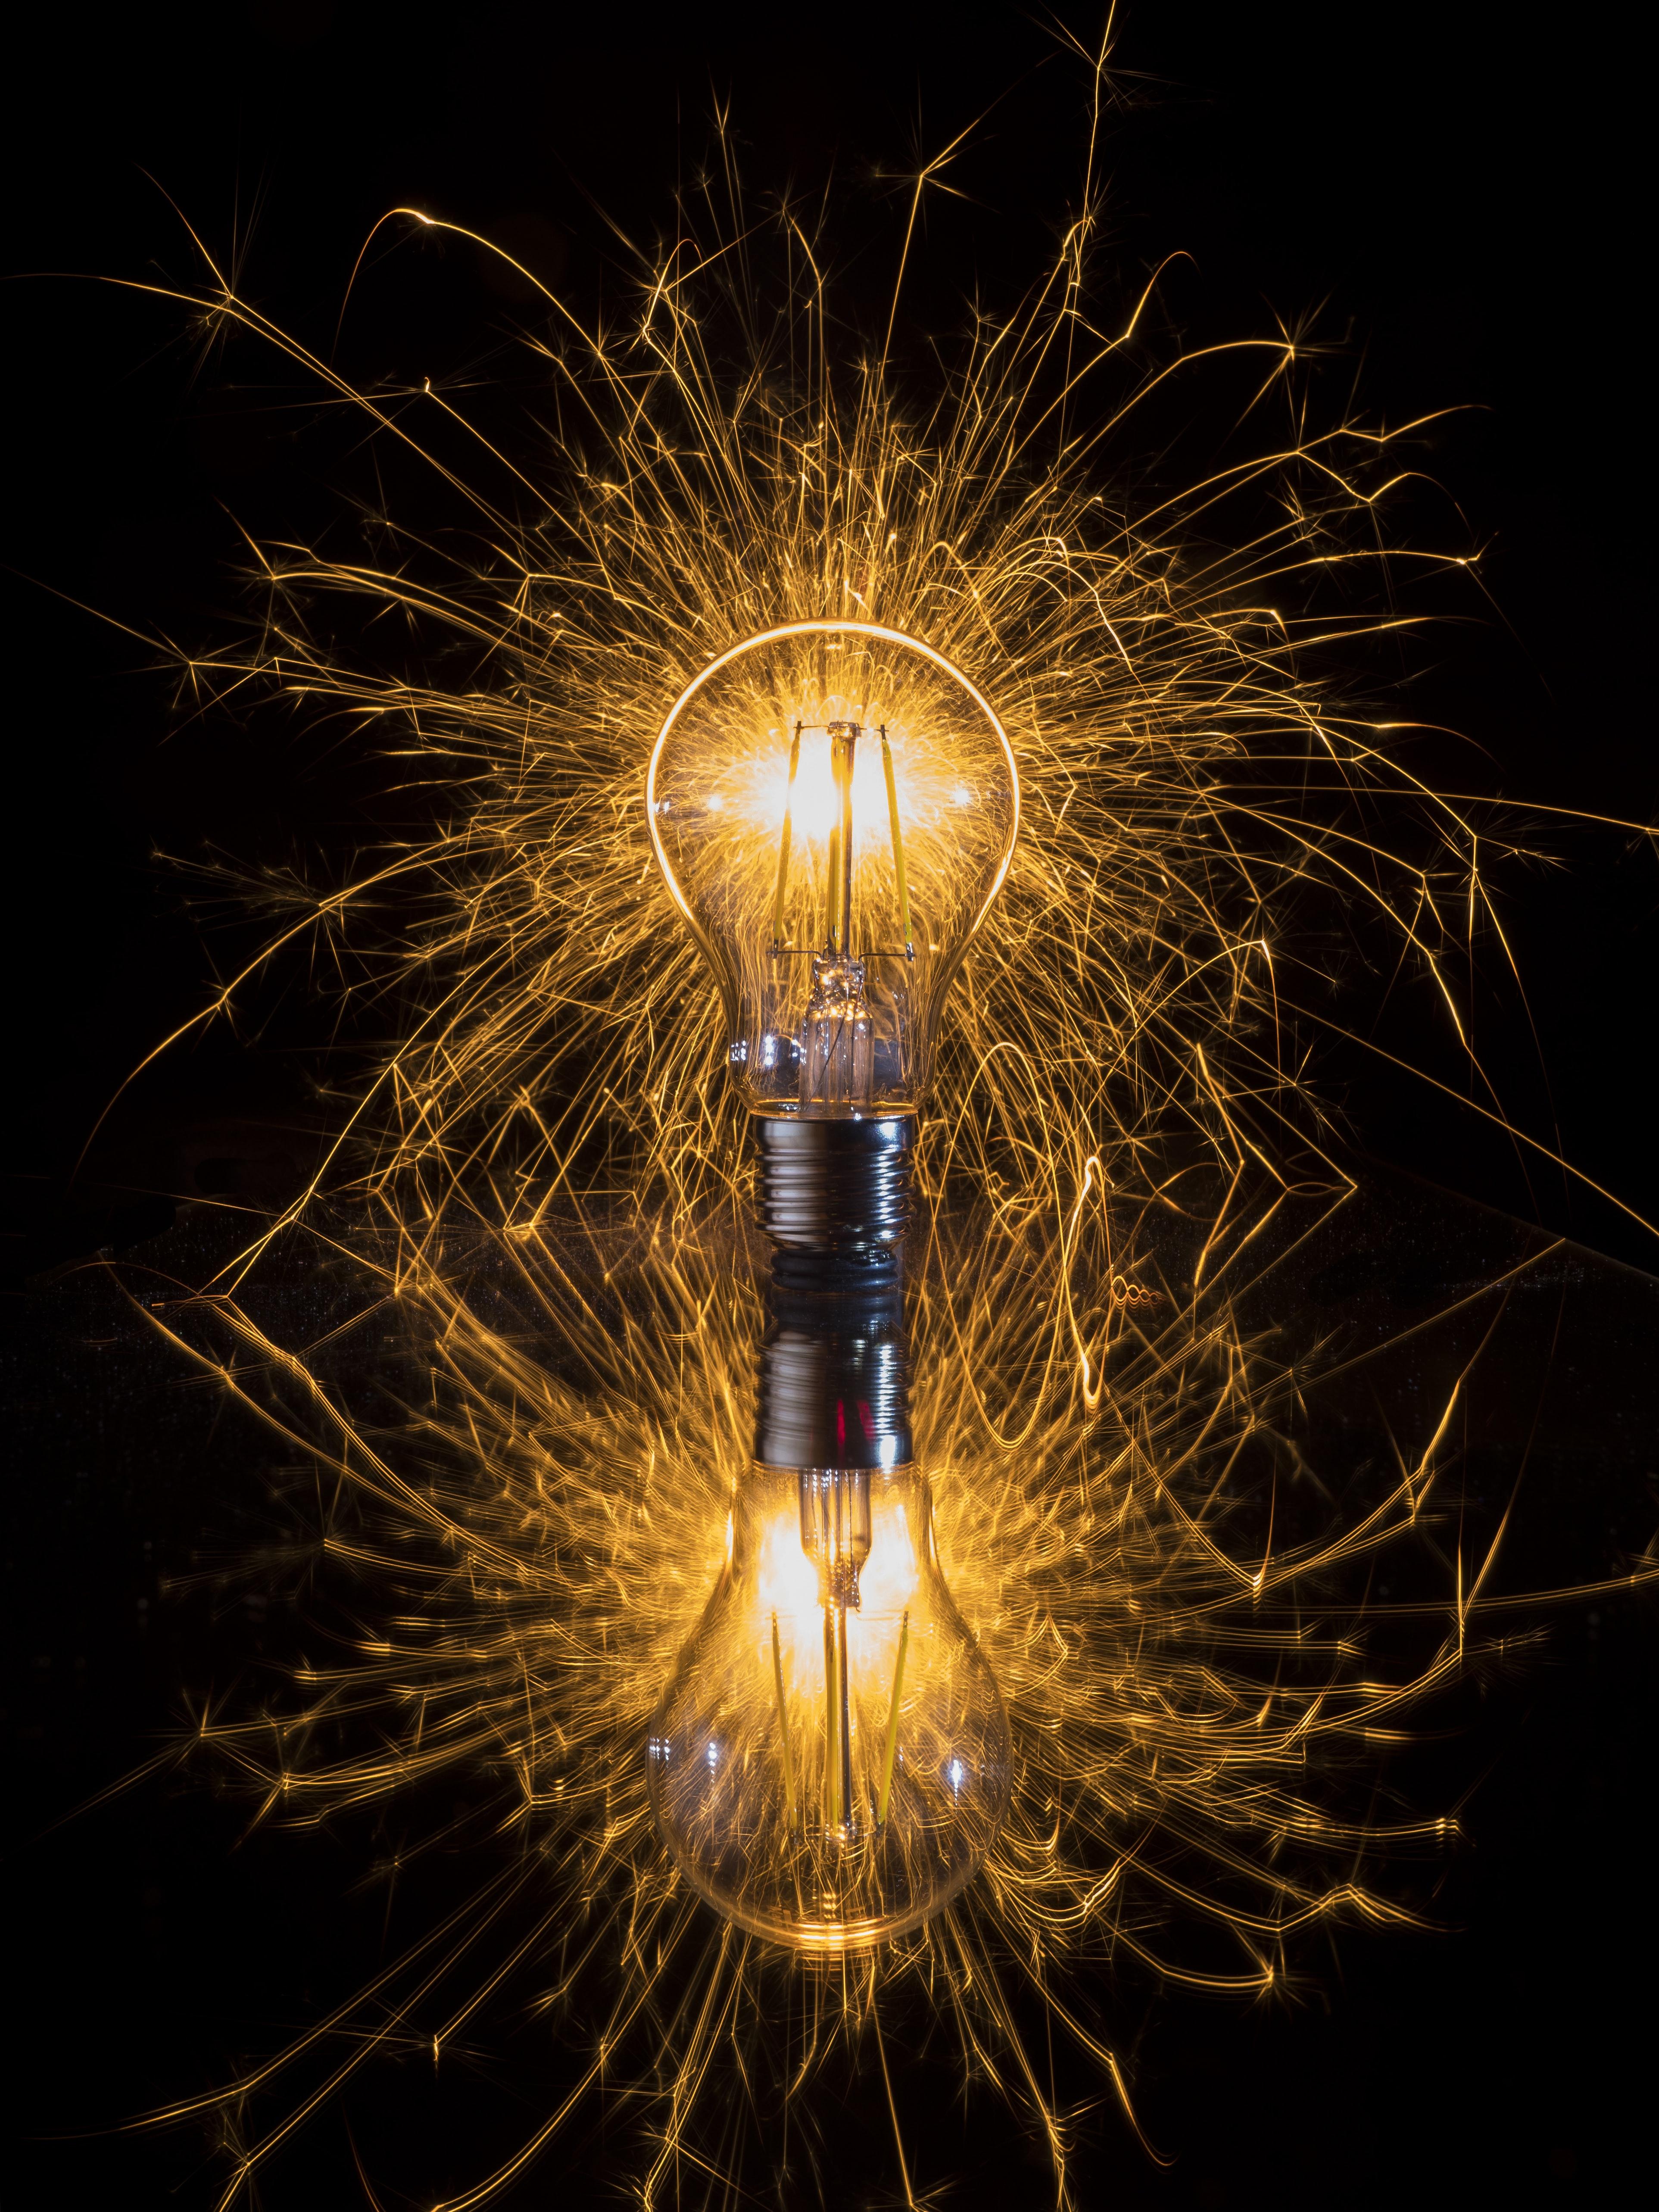 lightbulb - johan-extra-KsSUgqDwvb0-unsplash